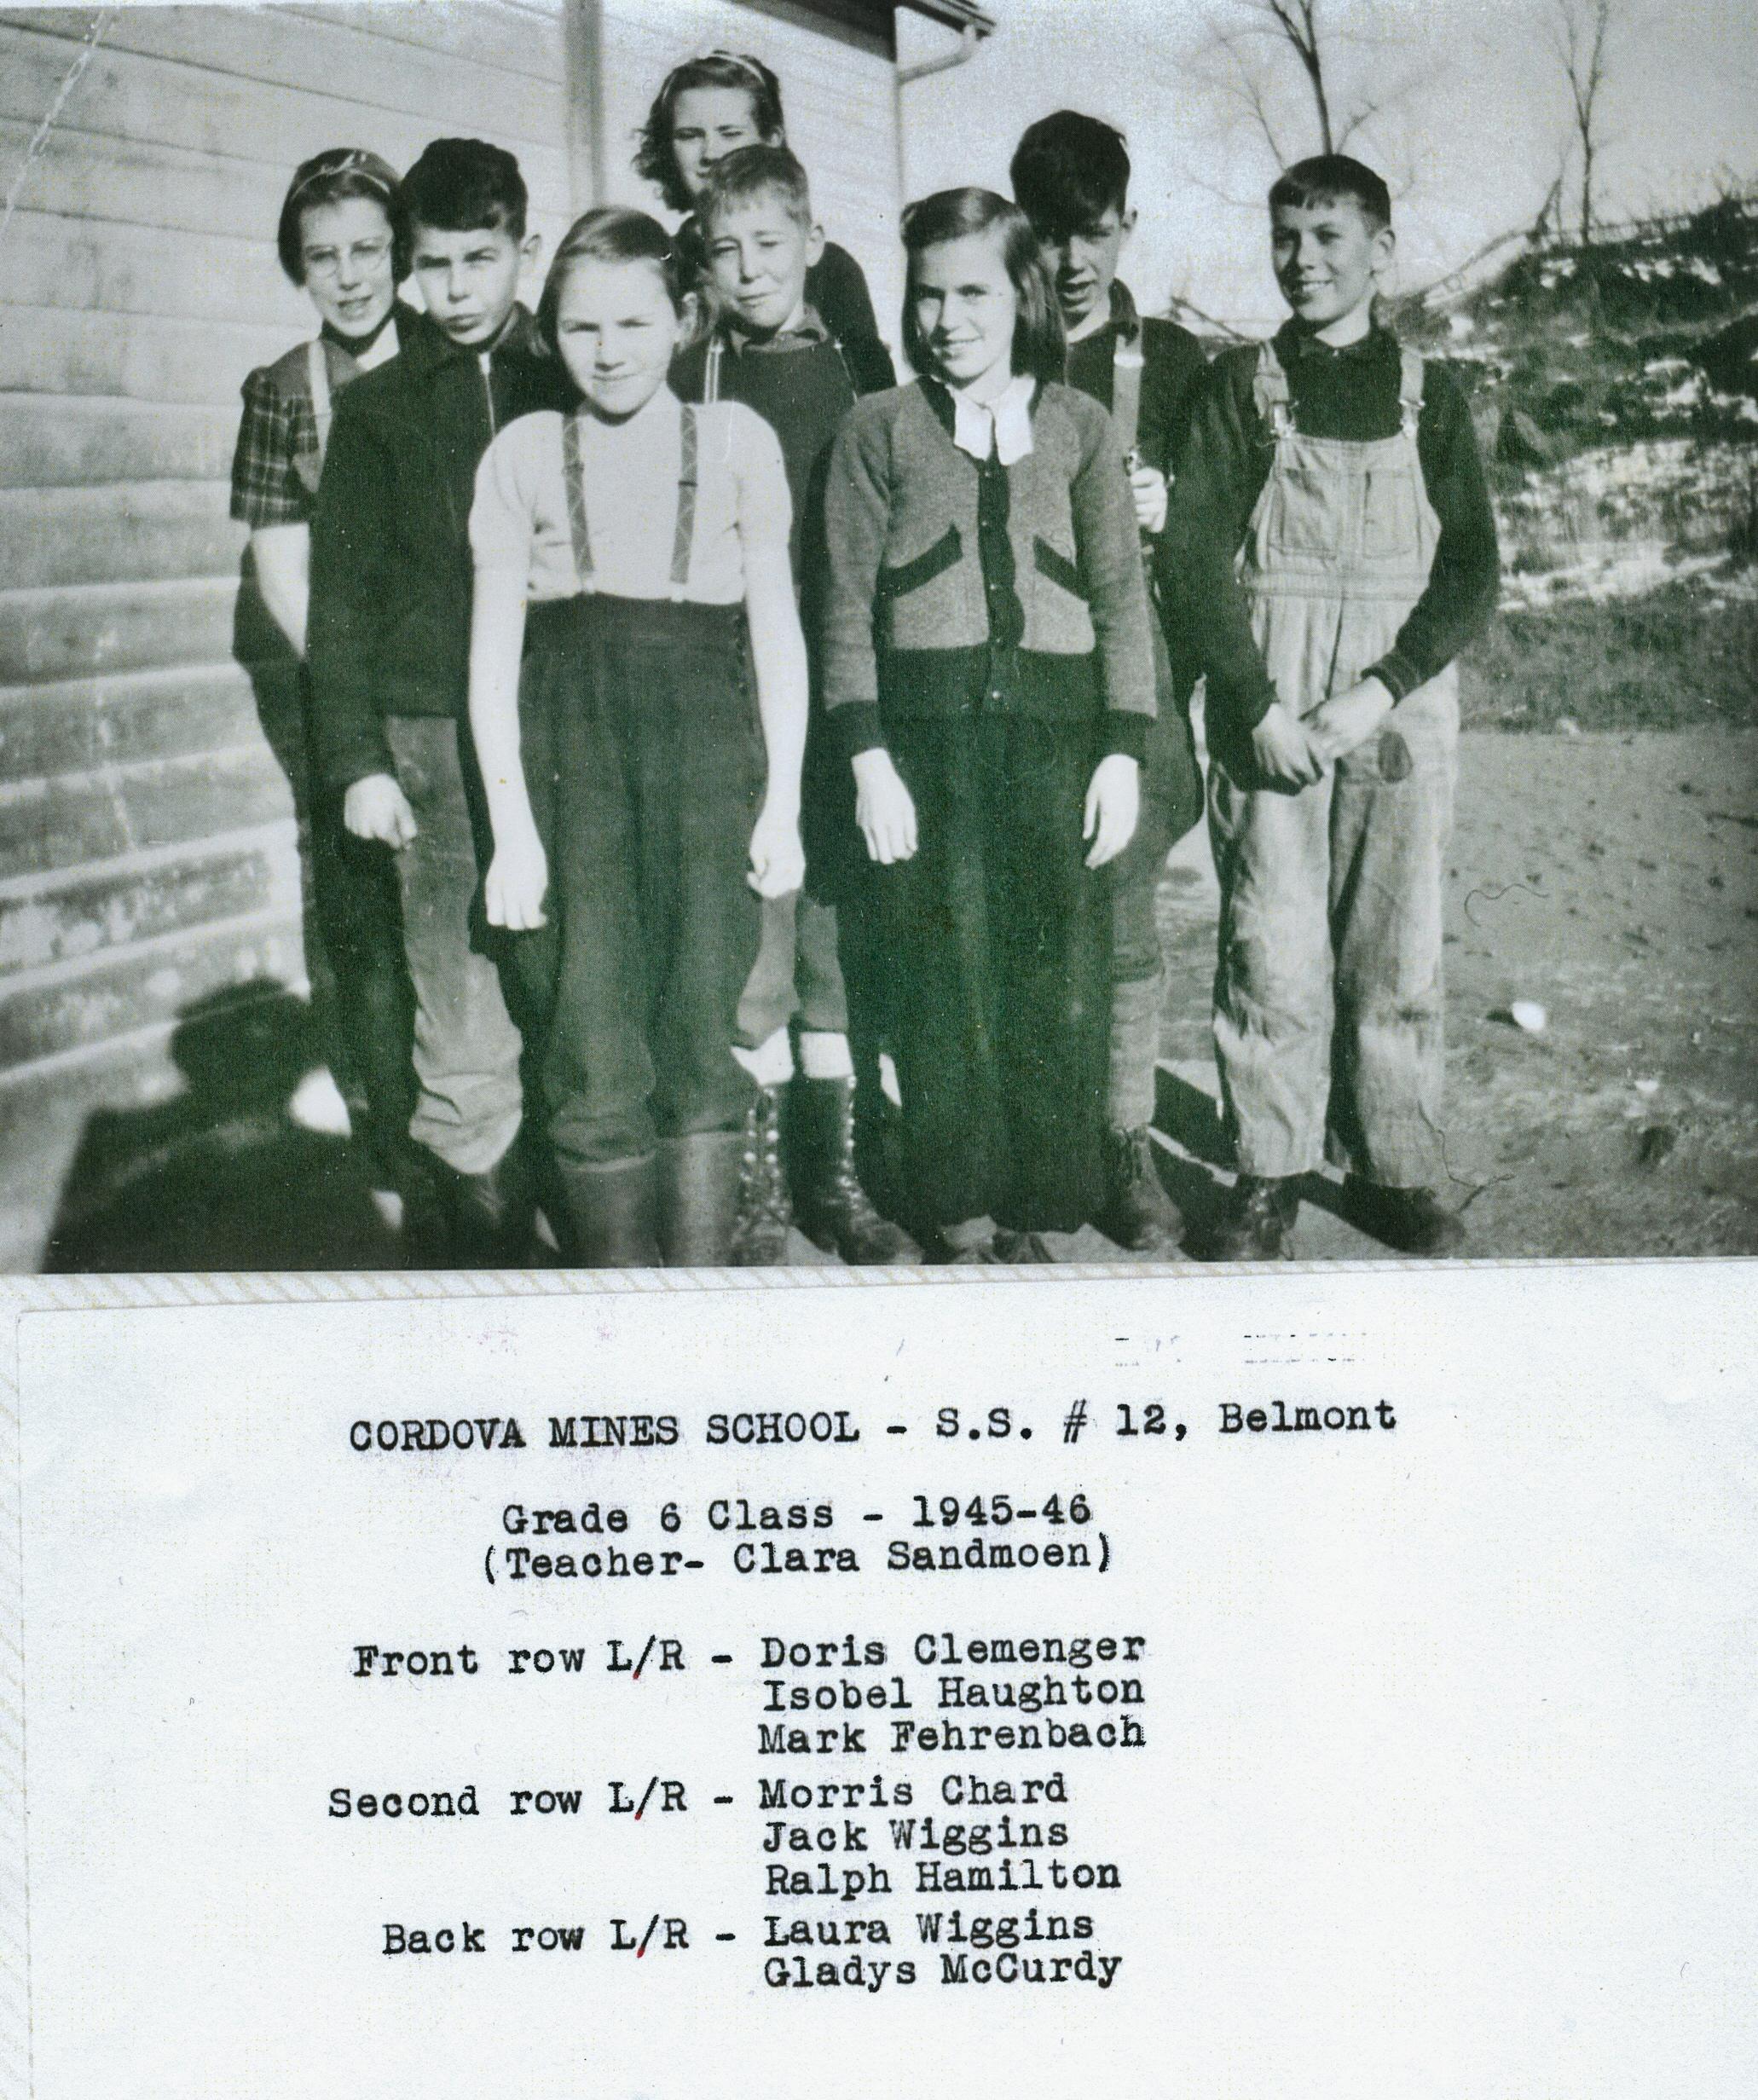 S.S. #12 Cordova Mines School 1945-46.jpg